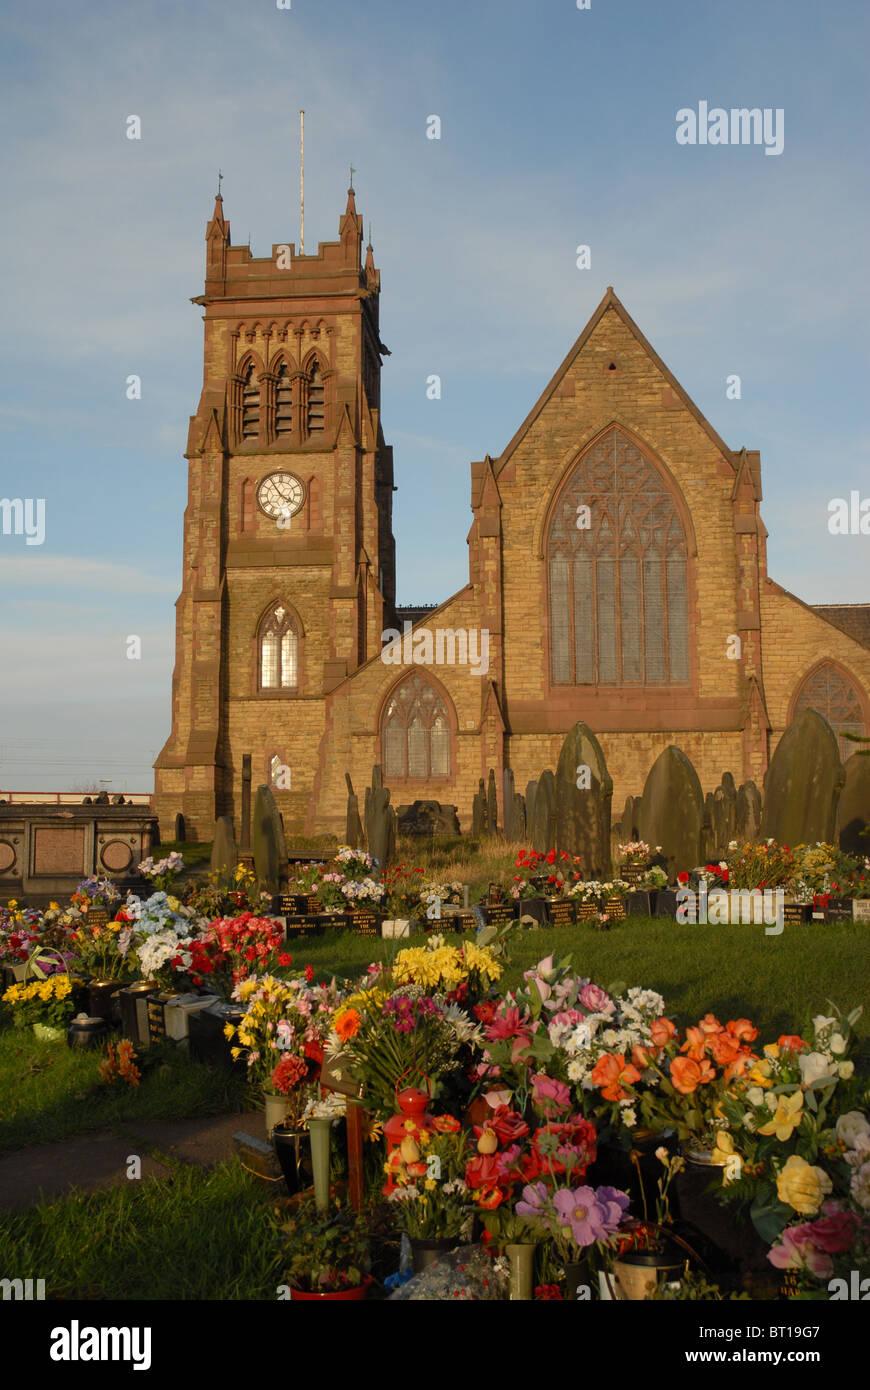 The parish Church of St Michael, Garston, Liverpool, Merseyside, England, UK. - Stock Image